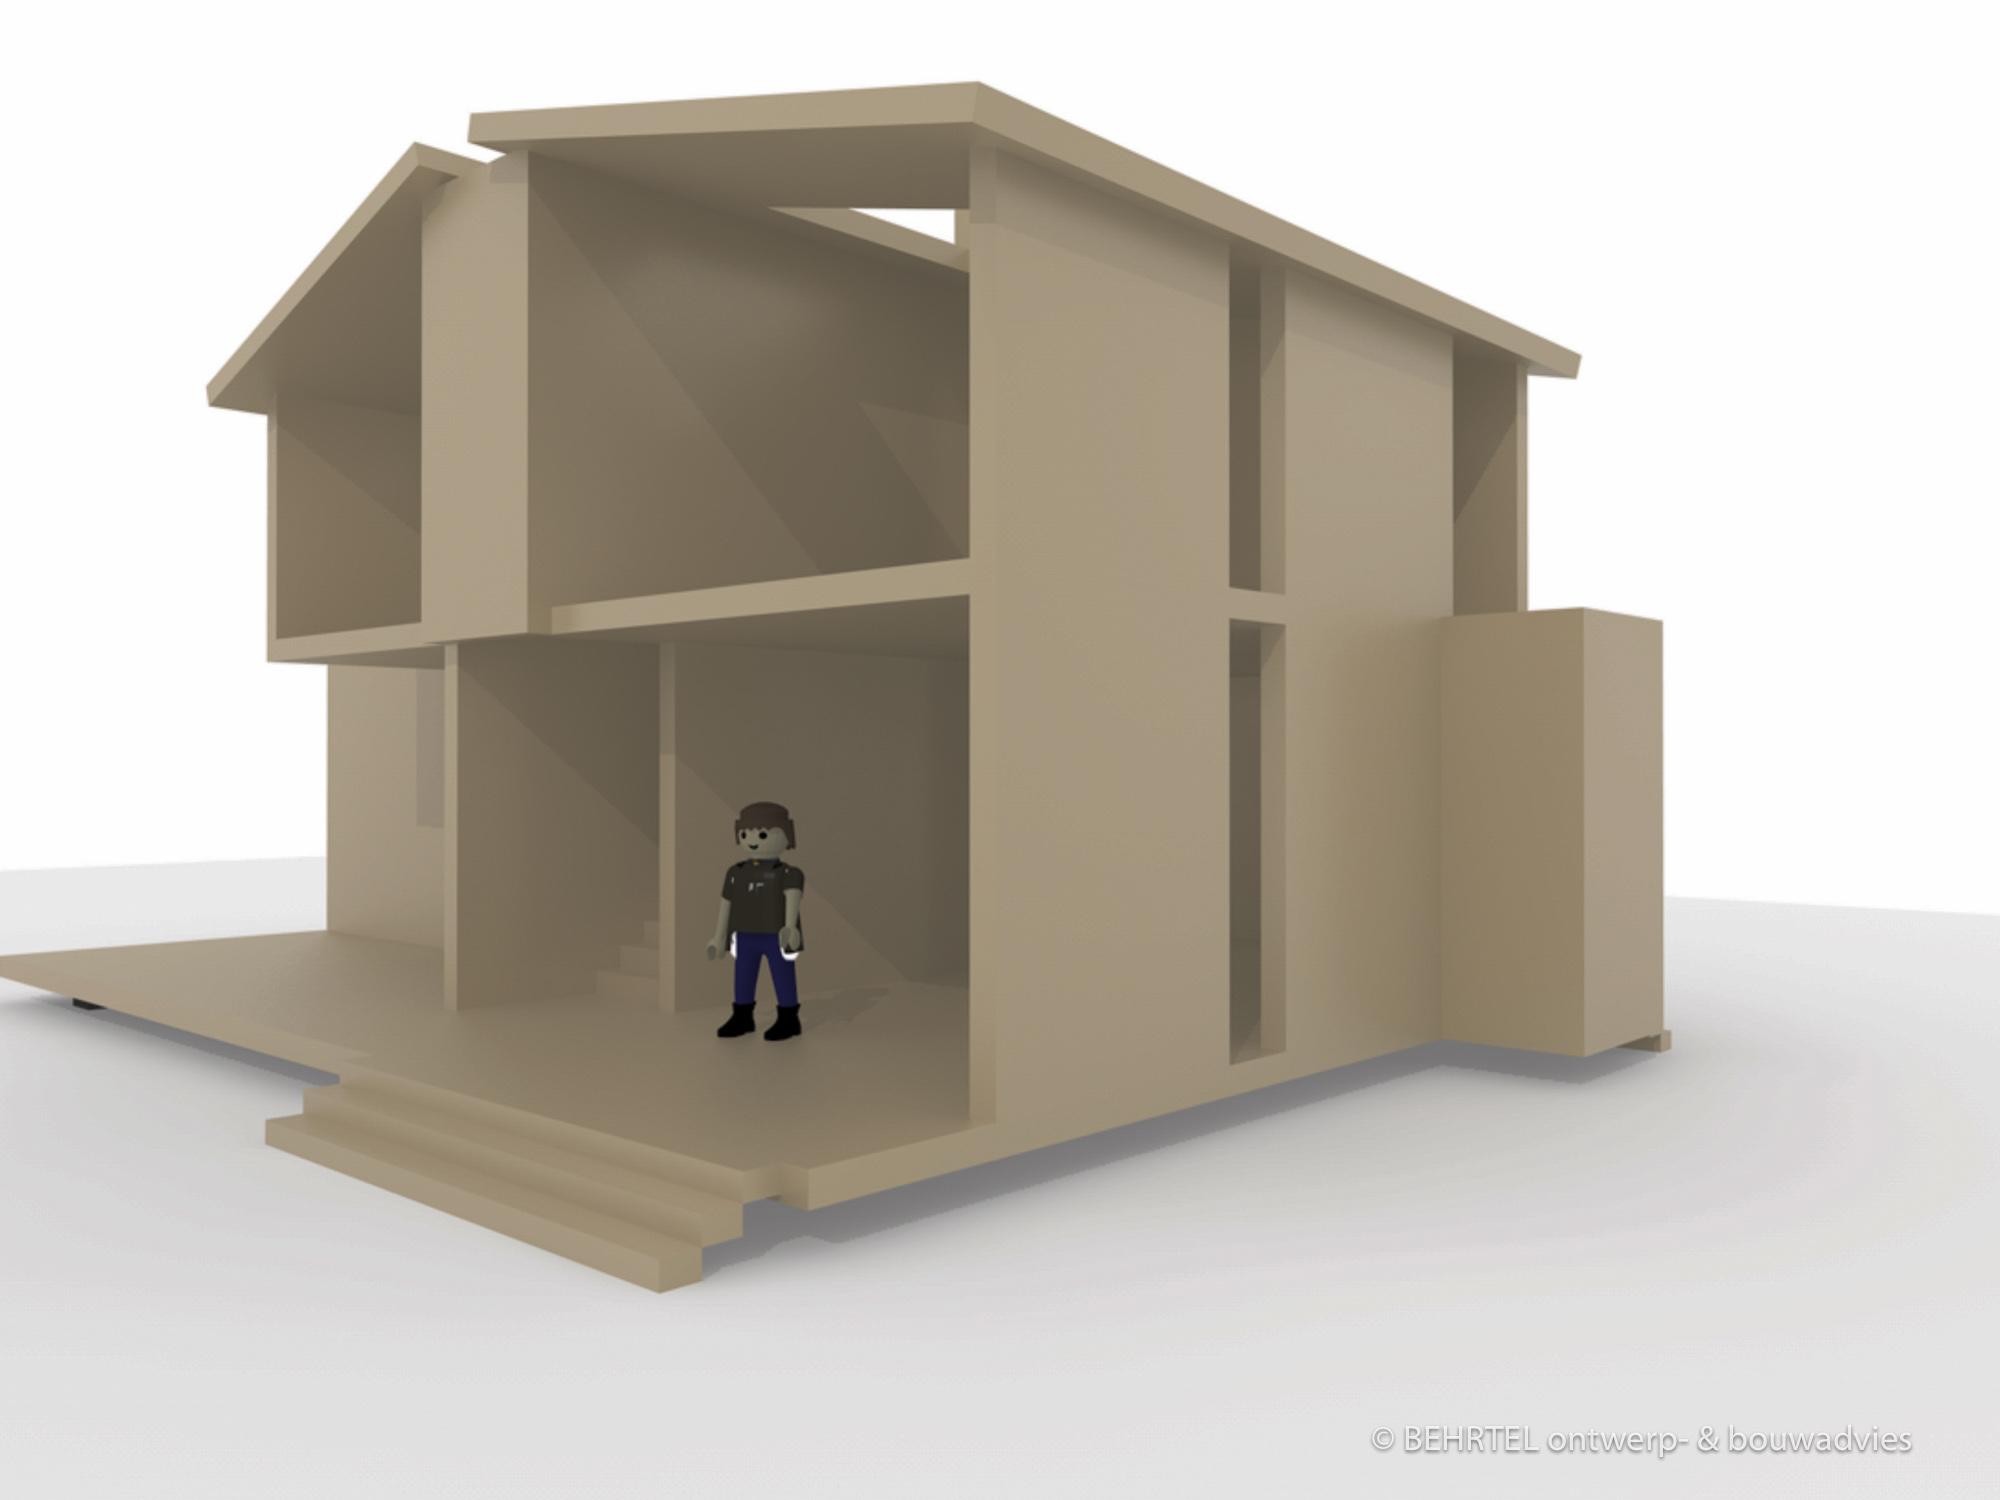 p15-004-poppenhuis-3d-2